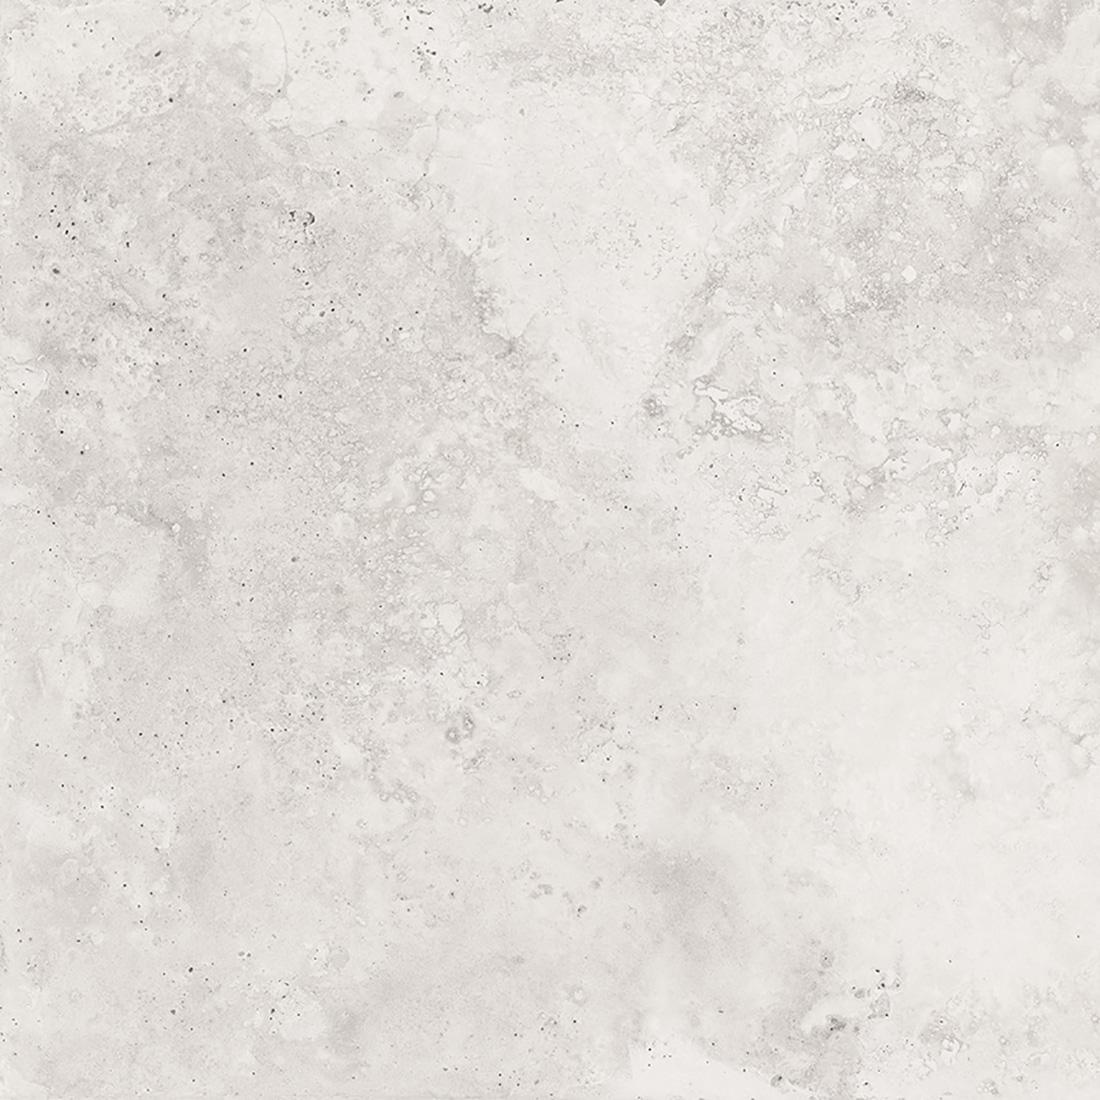 Milano 60x60 Silver Matt 1